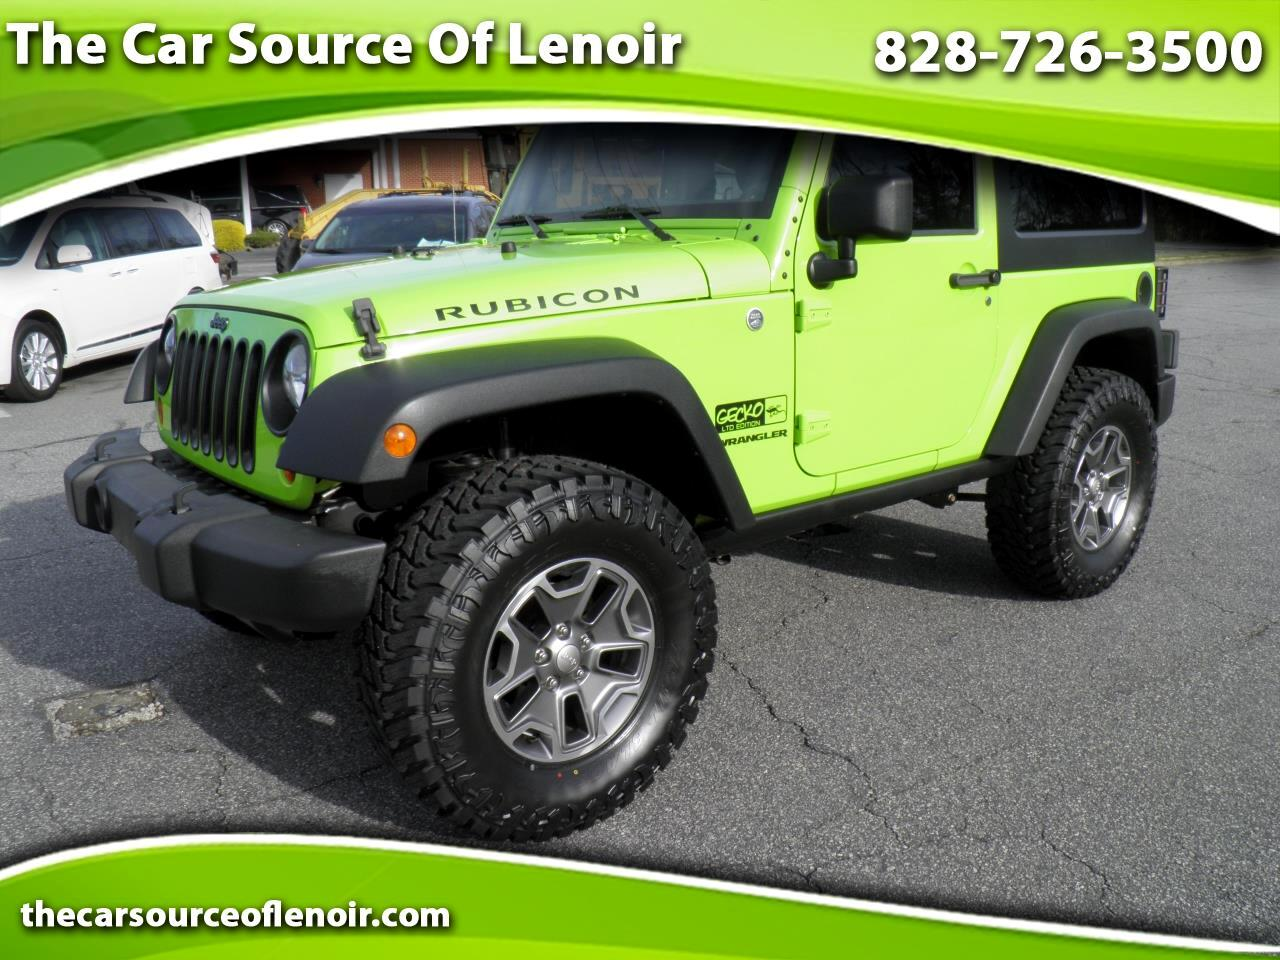 2013 Jeep Wrangler Rubicon 4WD